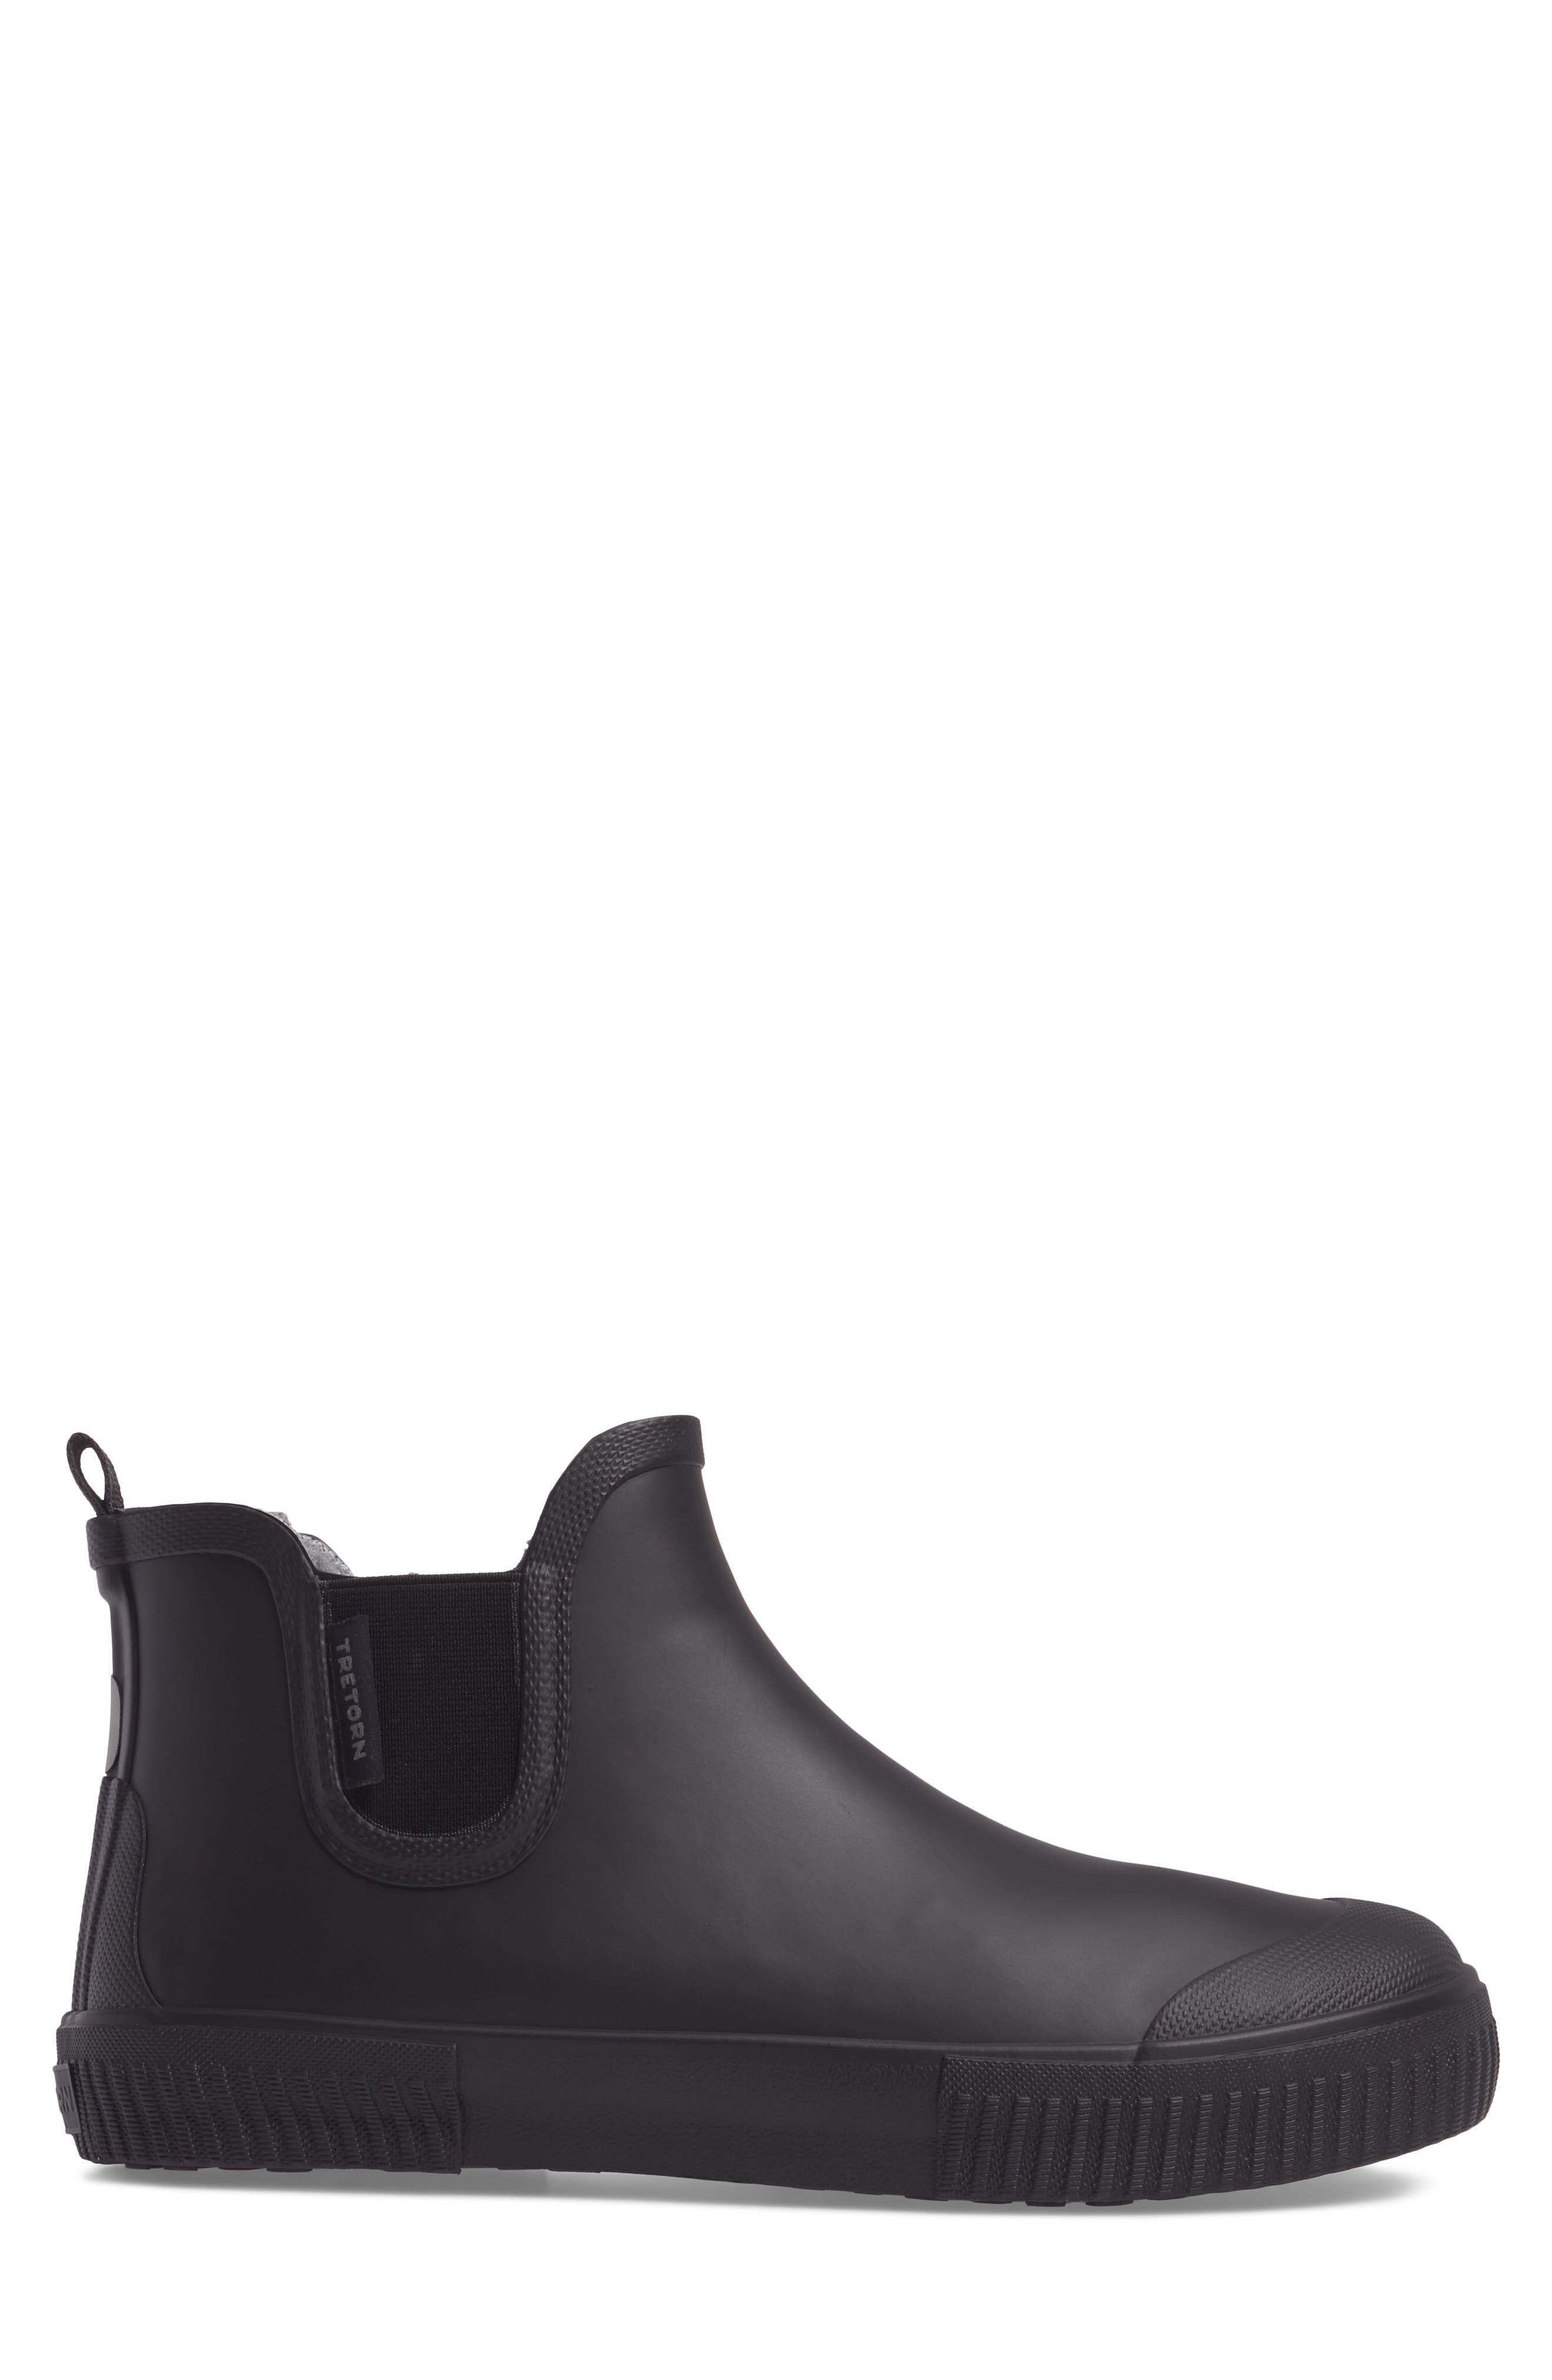 TRETORN, Guswnt Chelsea Waterproof Boot, Alternate thumbnail 3, color, BLACK/ BLACK